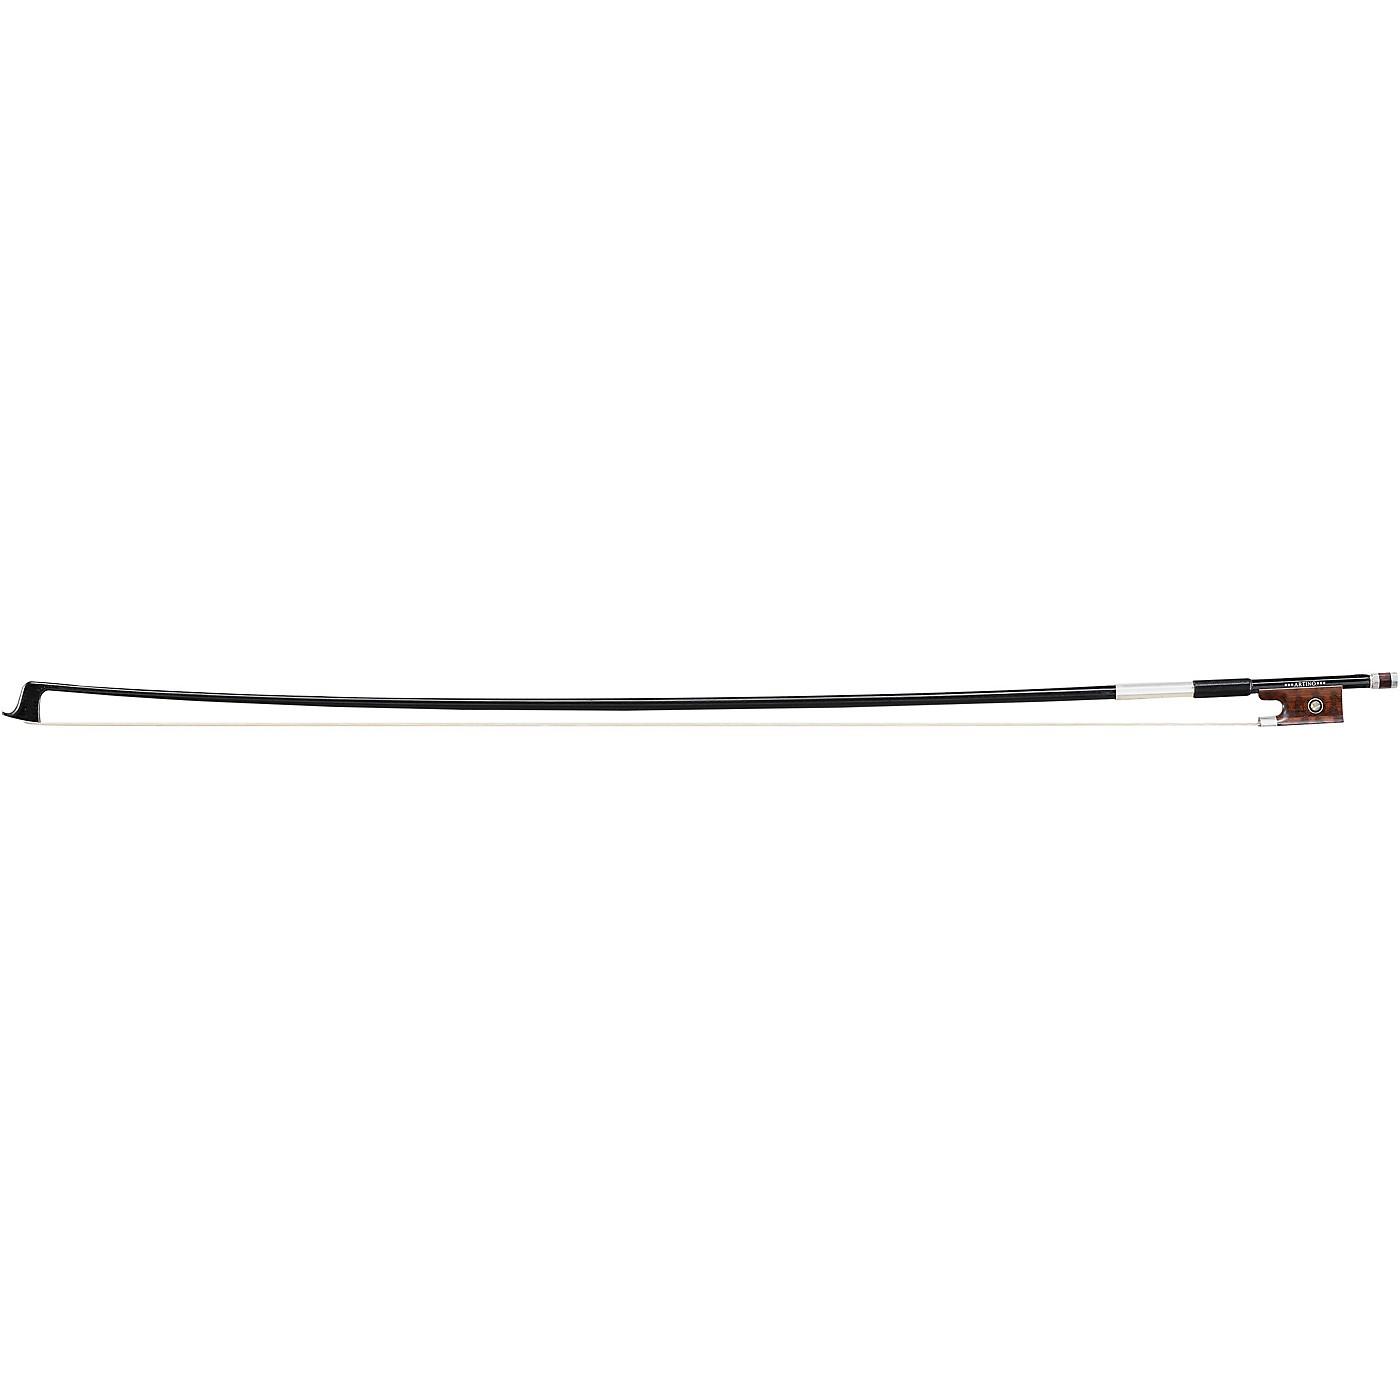 Artino Three Star Deluxe Carbon Fiber Violin Bow thumbnail